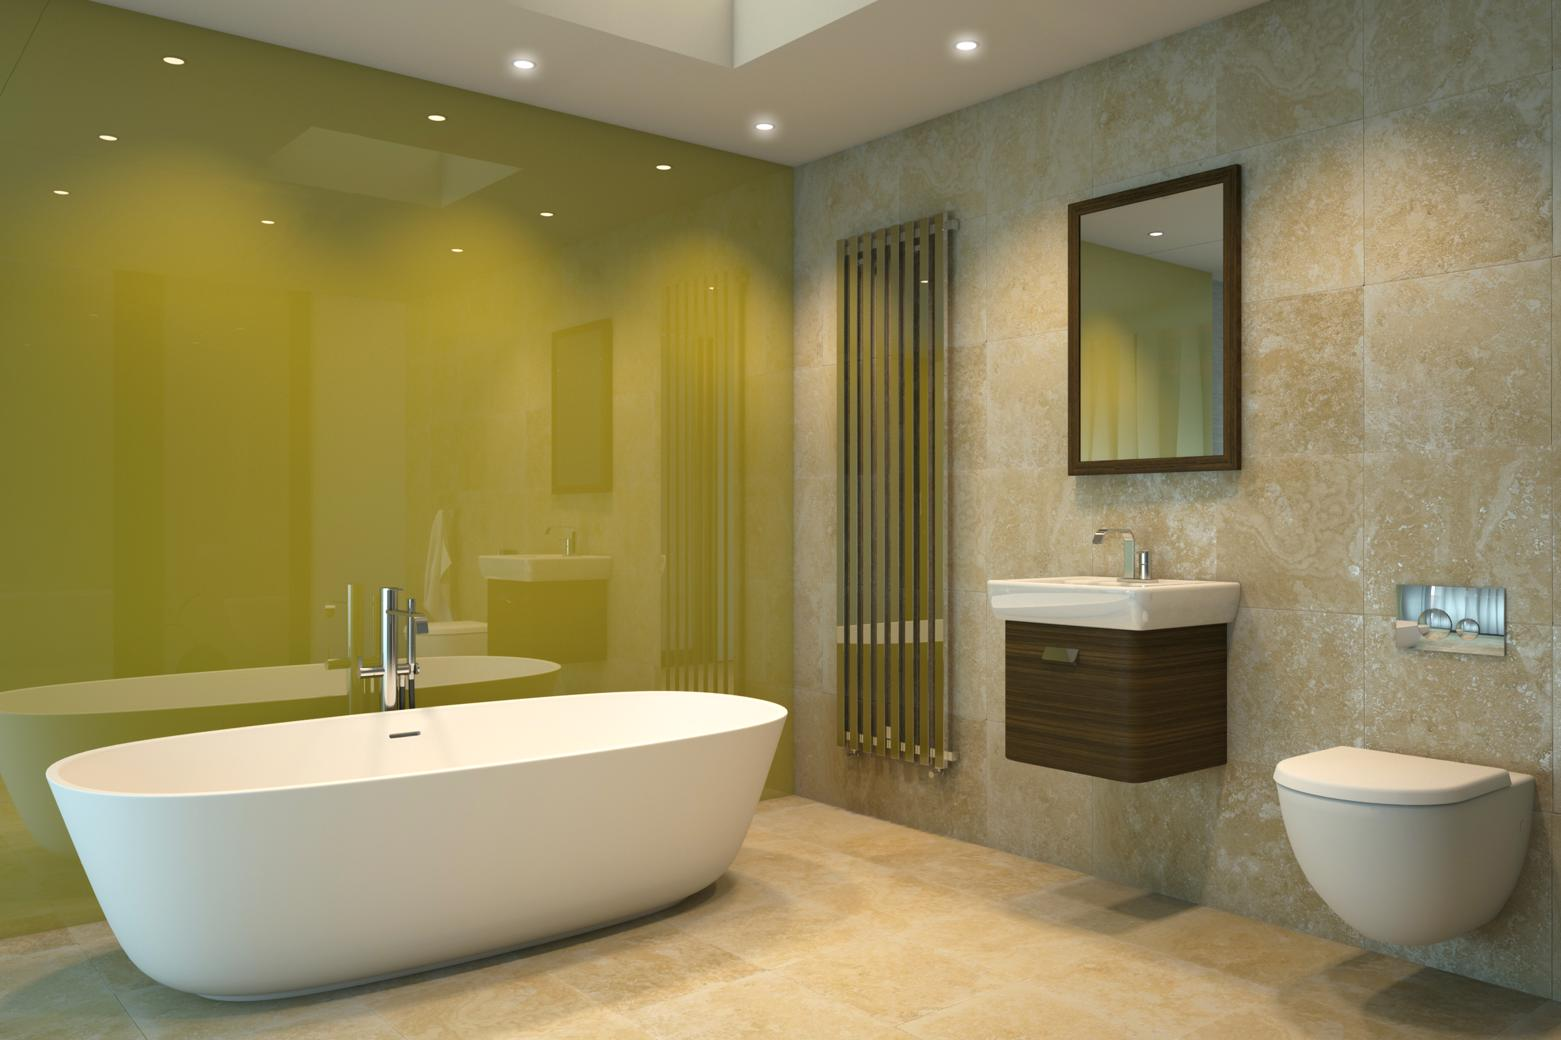 Lustrolite Forest Bathroom Lifestyle-156